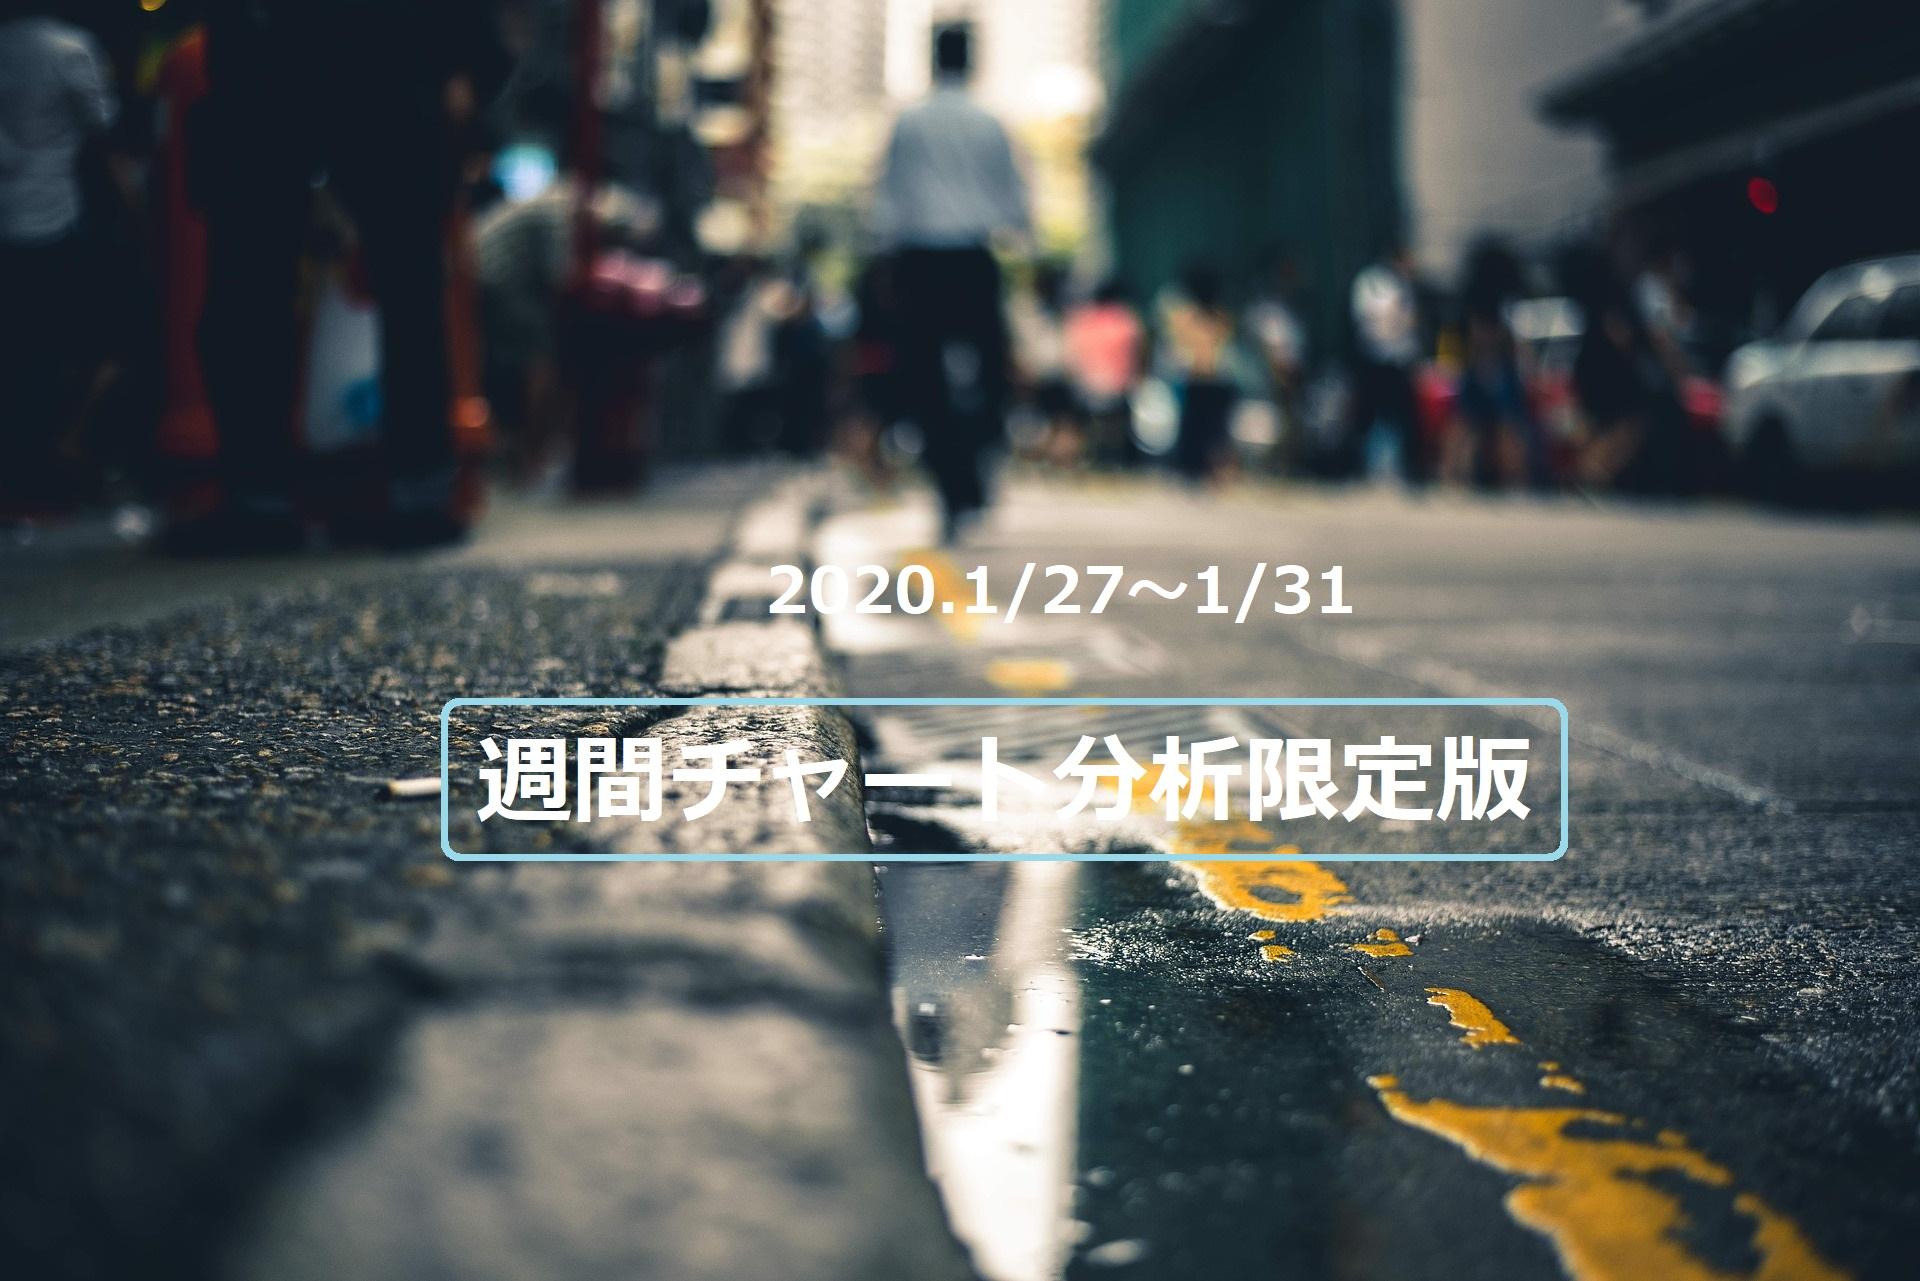 【FX】週間チャート分析限定版【2020.1/27~1/31】